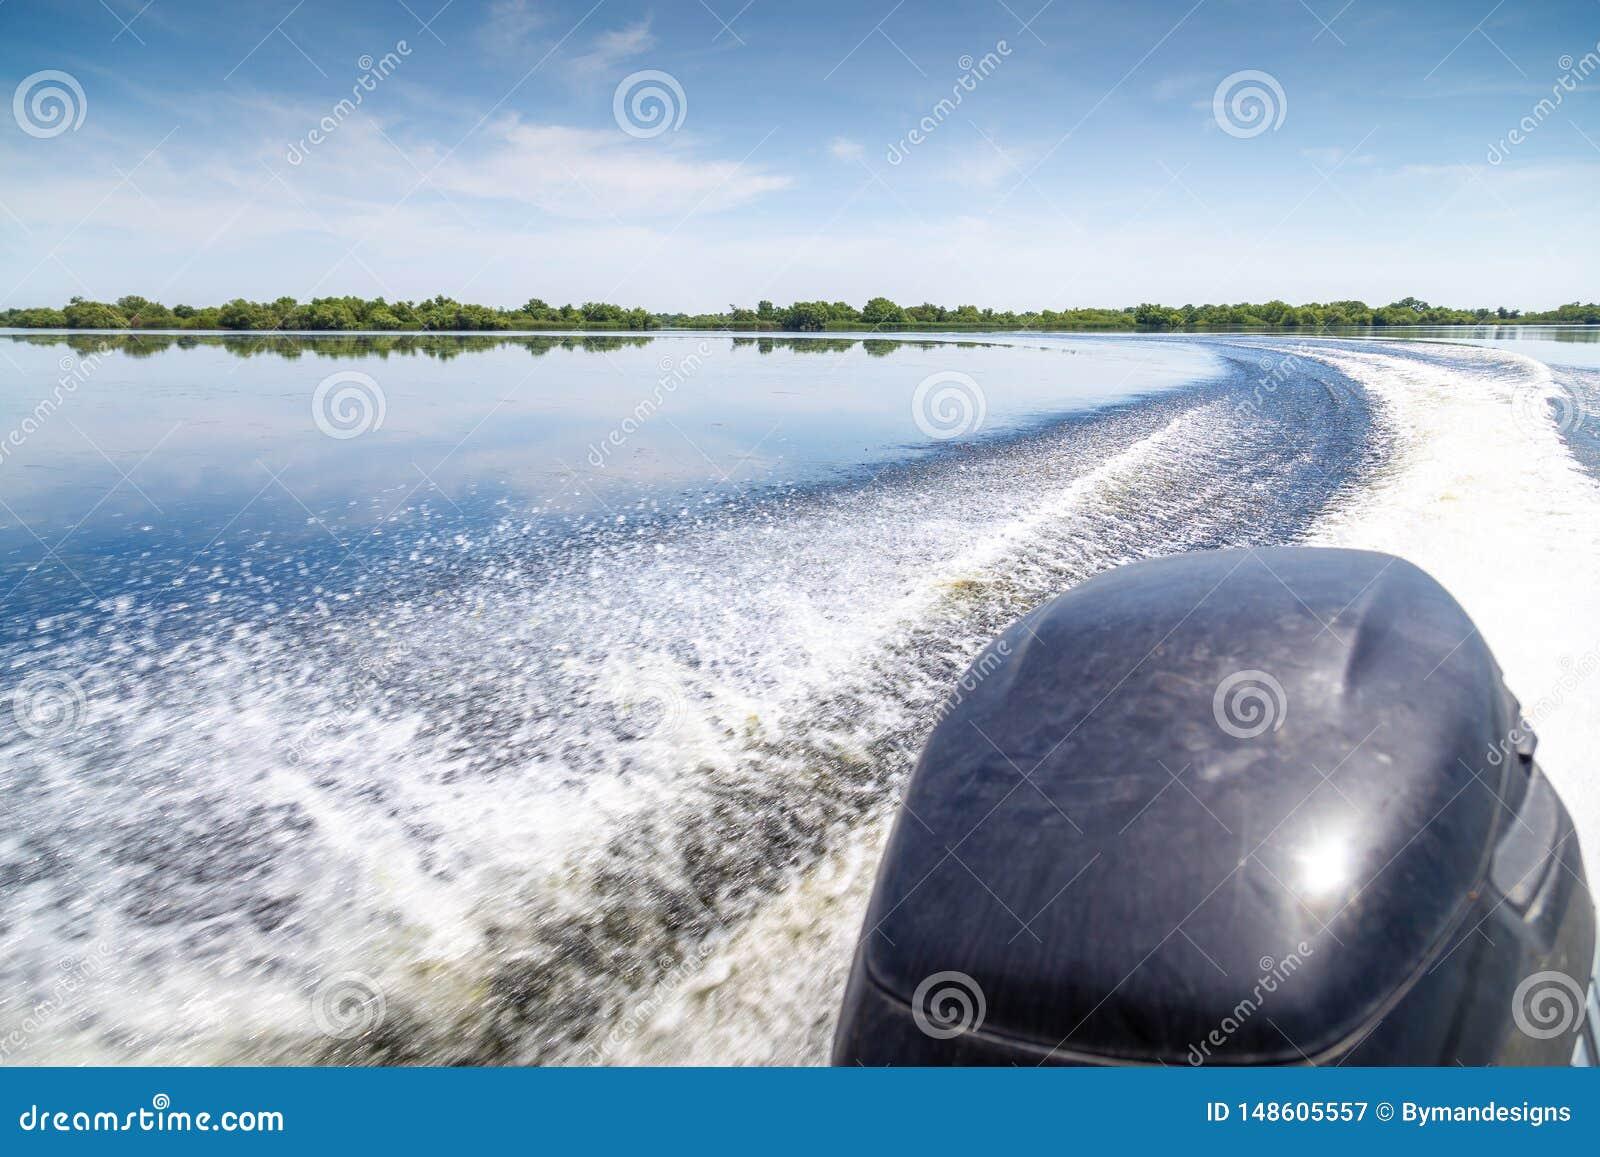 Trail of beautiful water from motor boat in Danube Delta, Romania